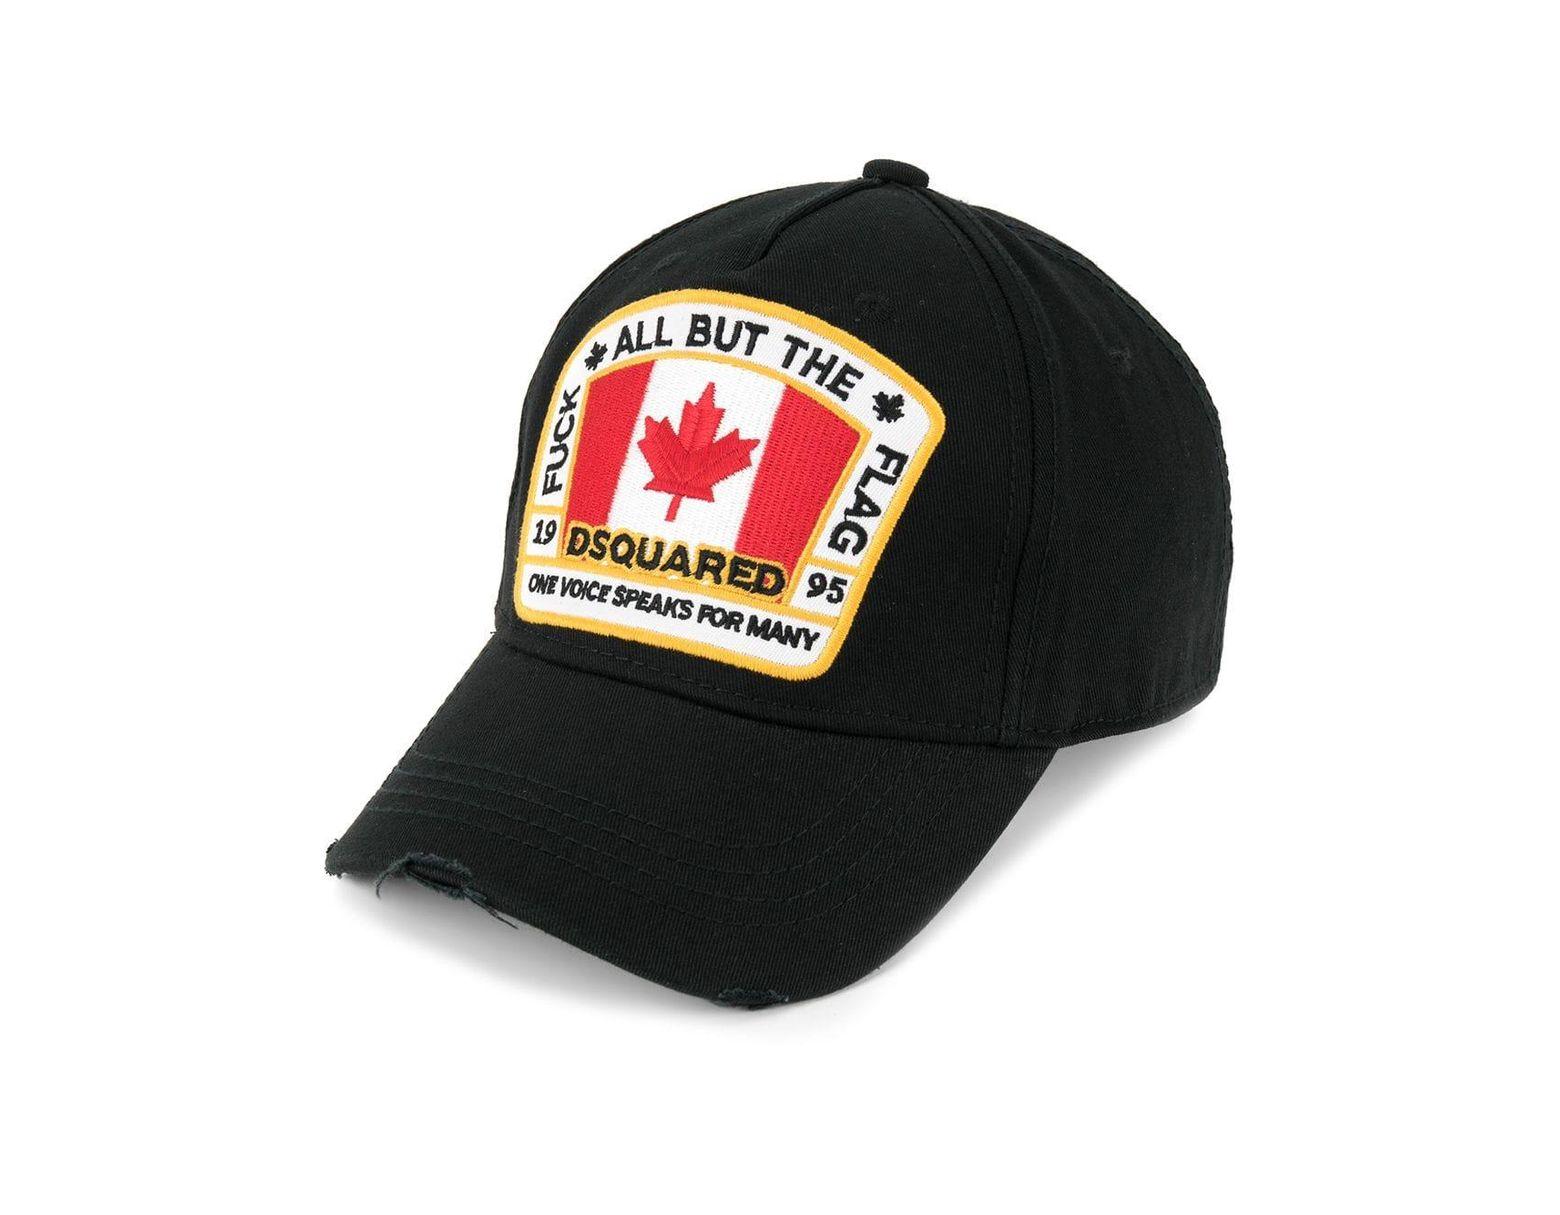 76208f1d9 Men's Black Canadian Flag Patch Baseball Cap